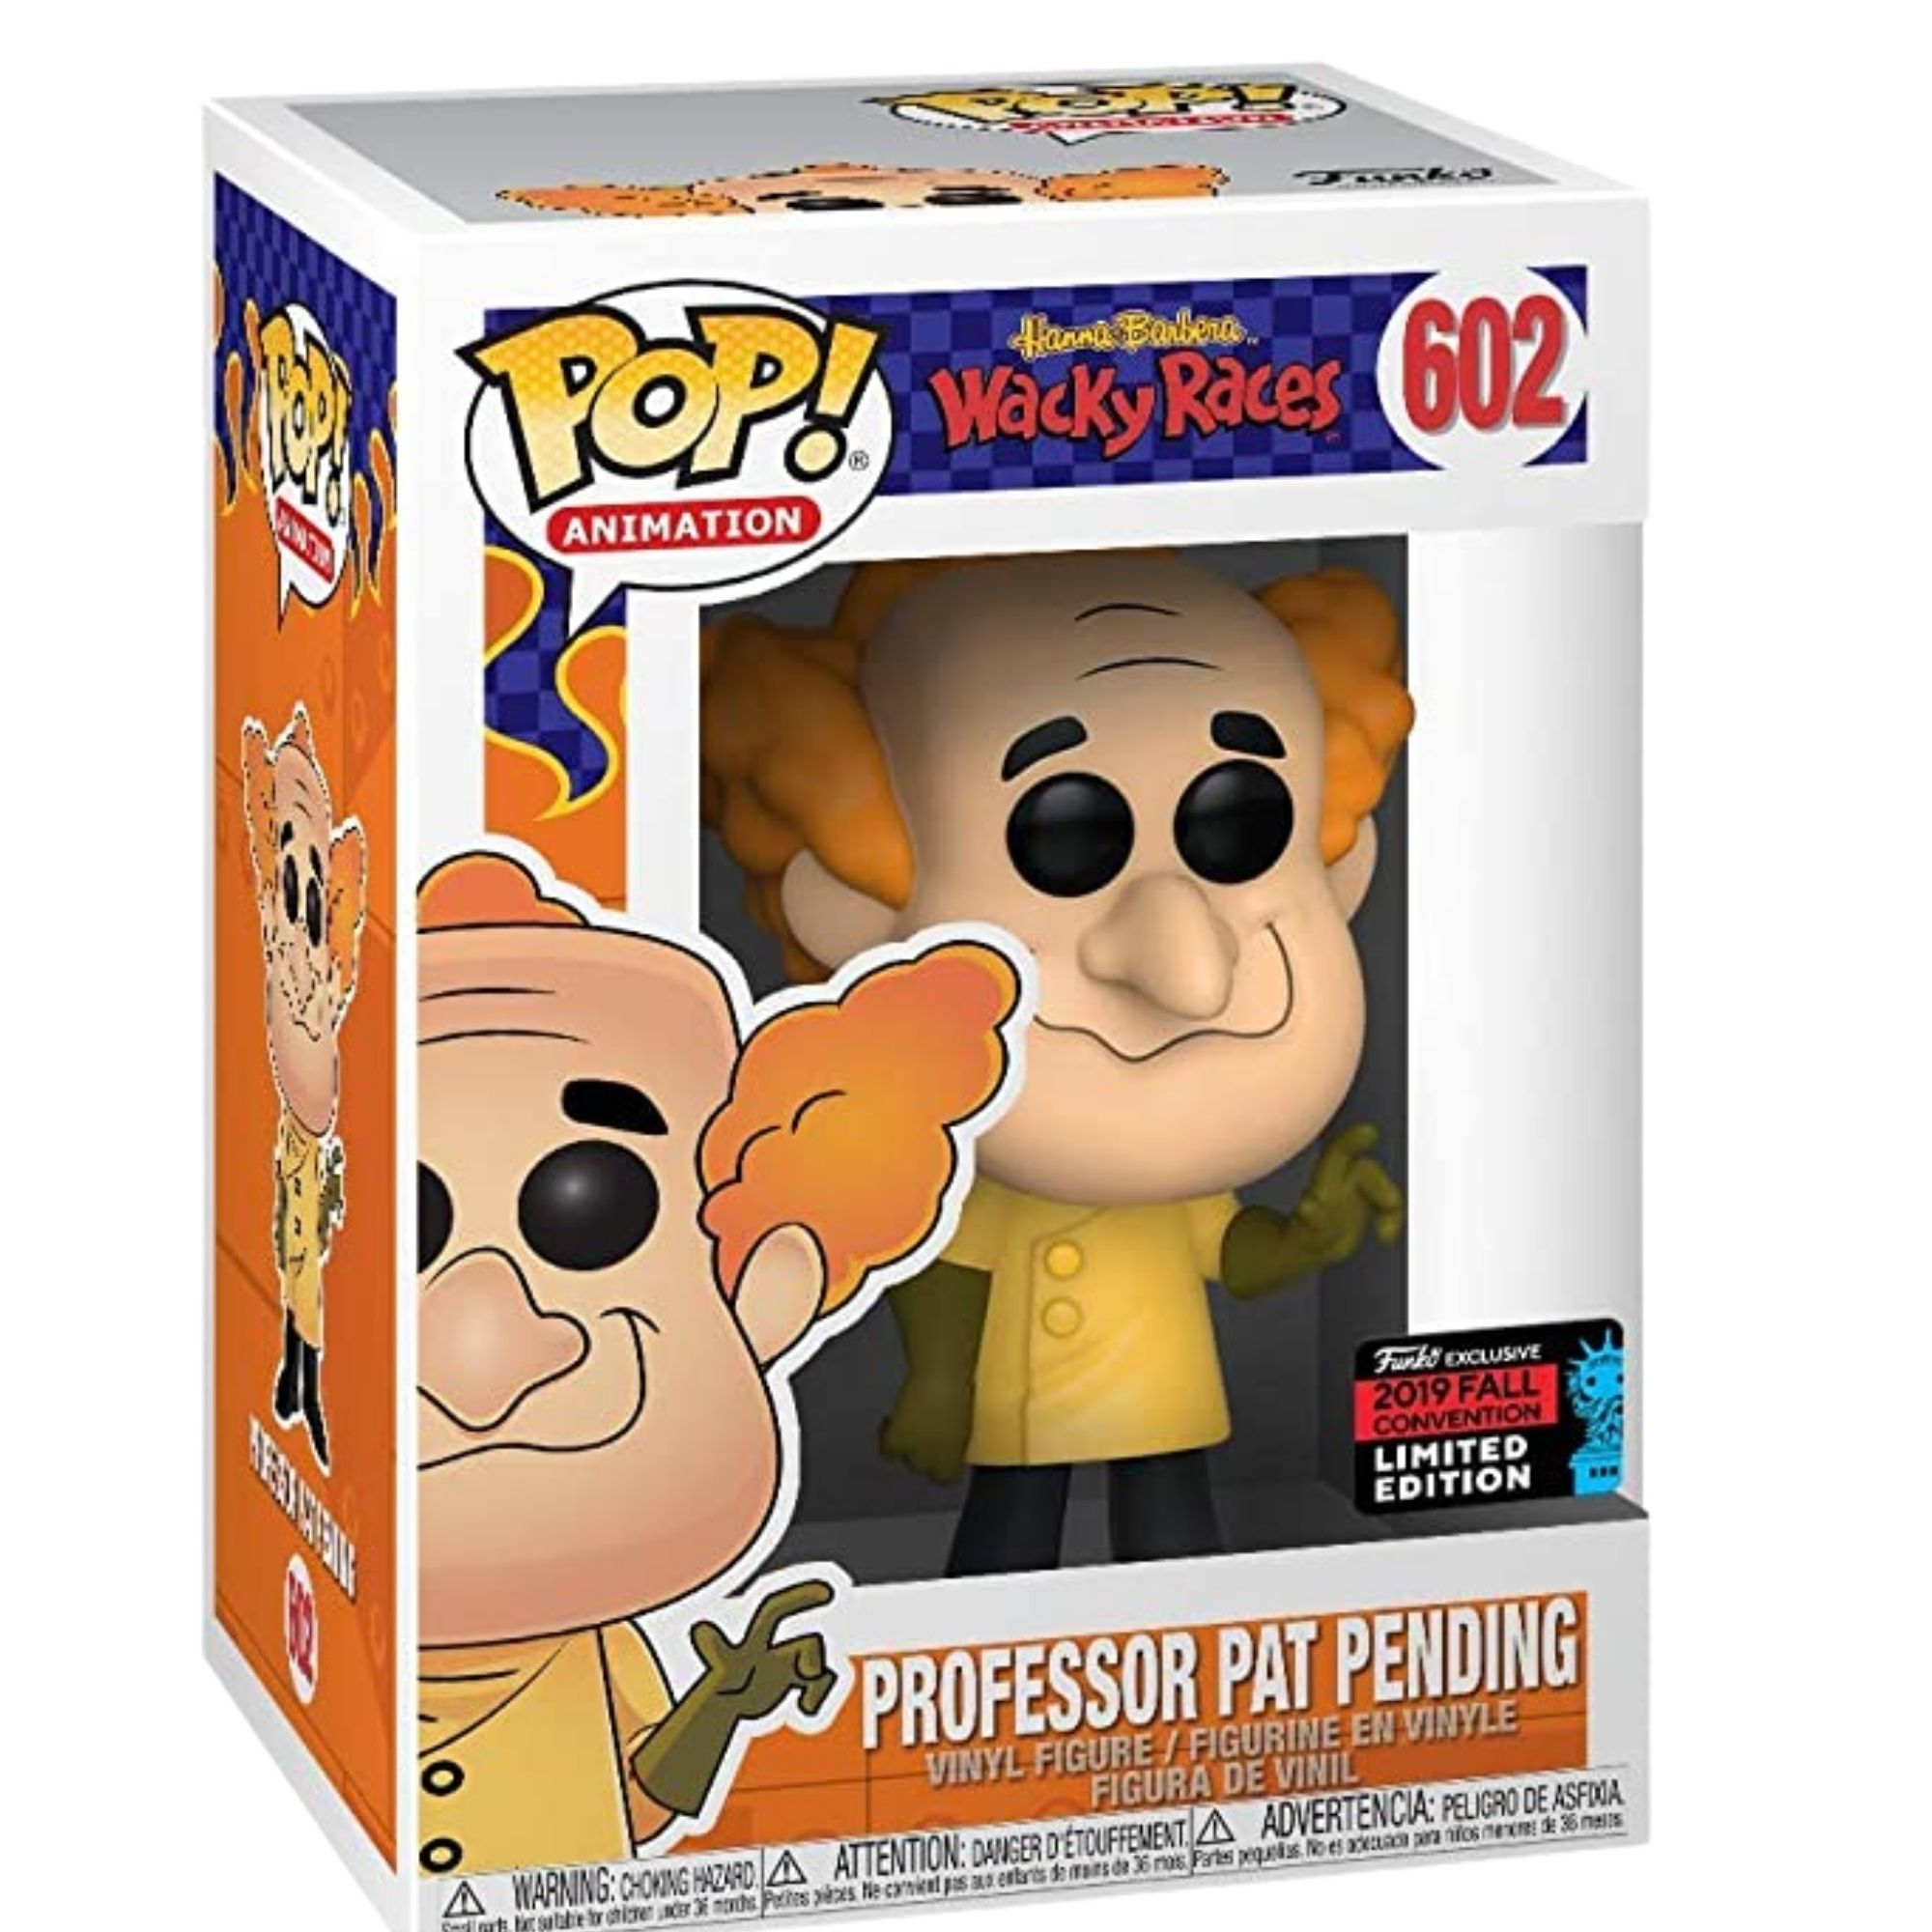 Funko Pop Professor Pat Pending Wacky Races Nycc 19 #602  - Game Land Brinquedos